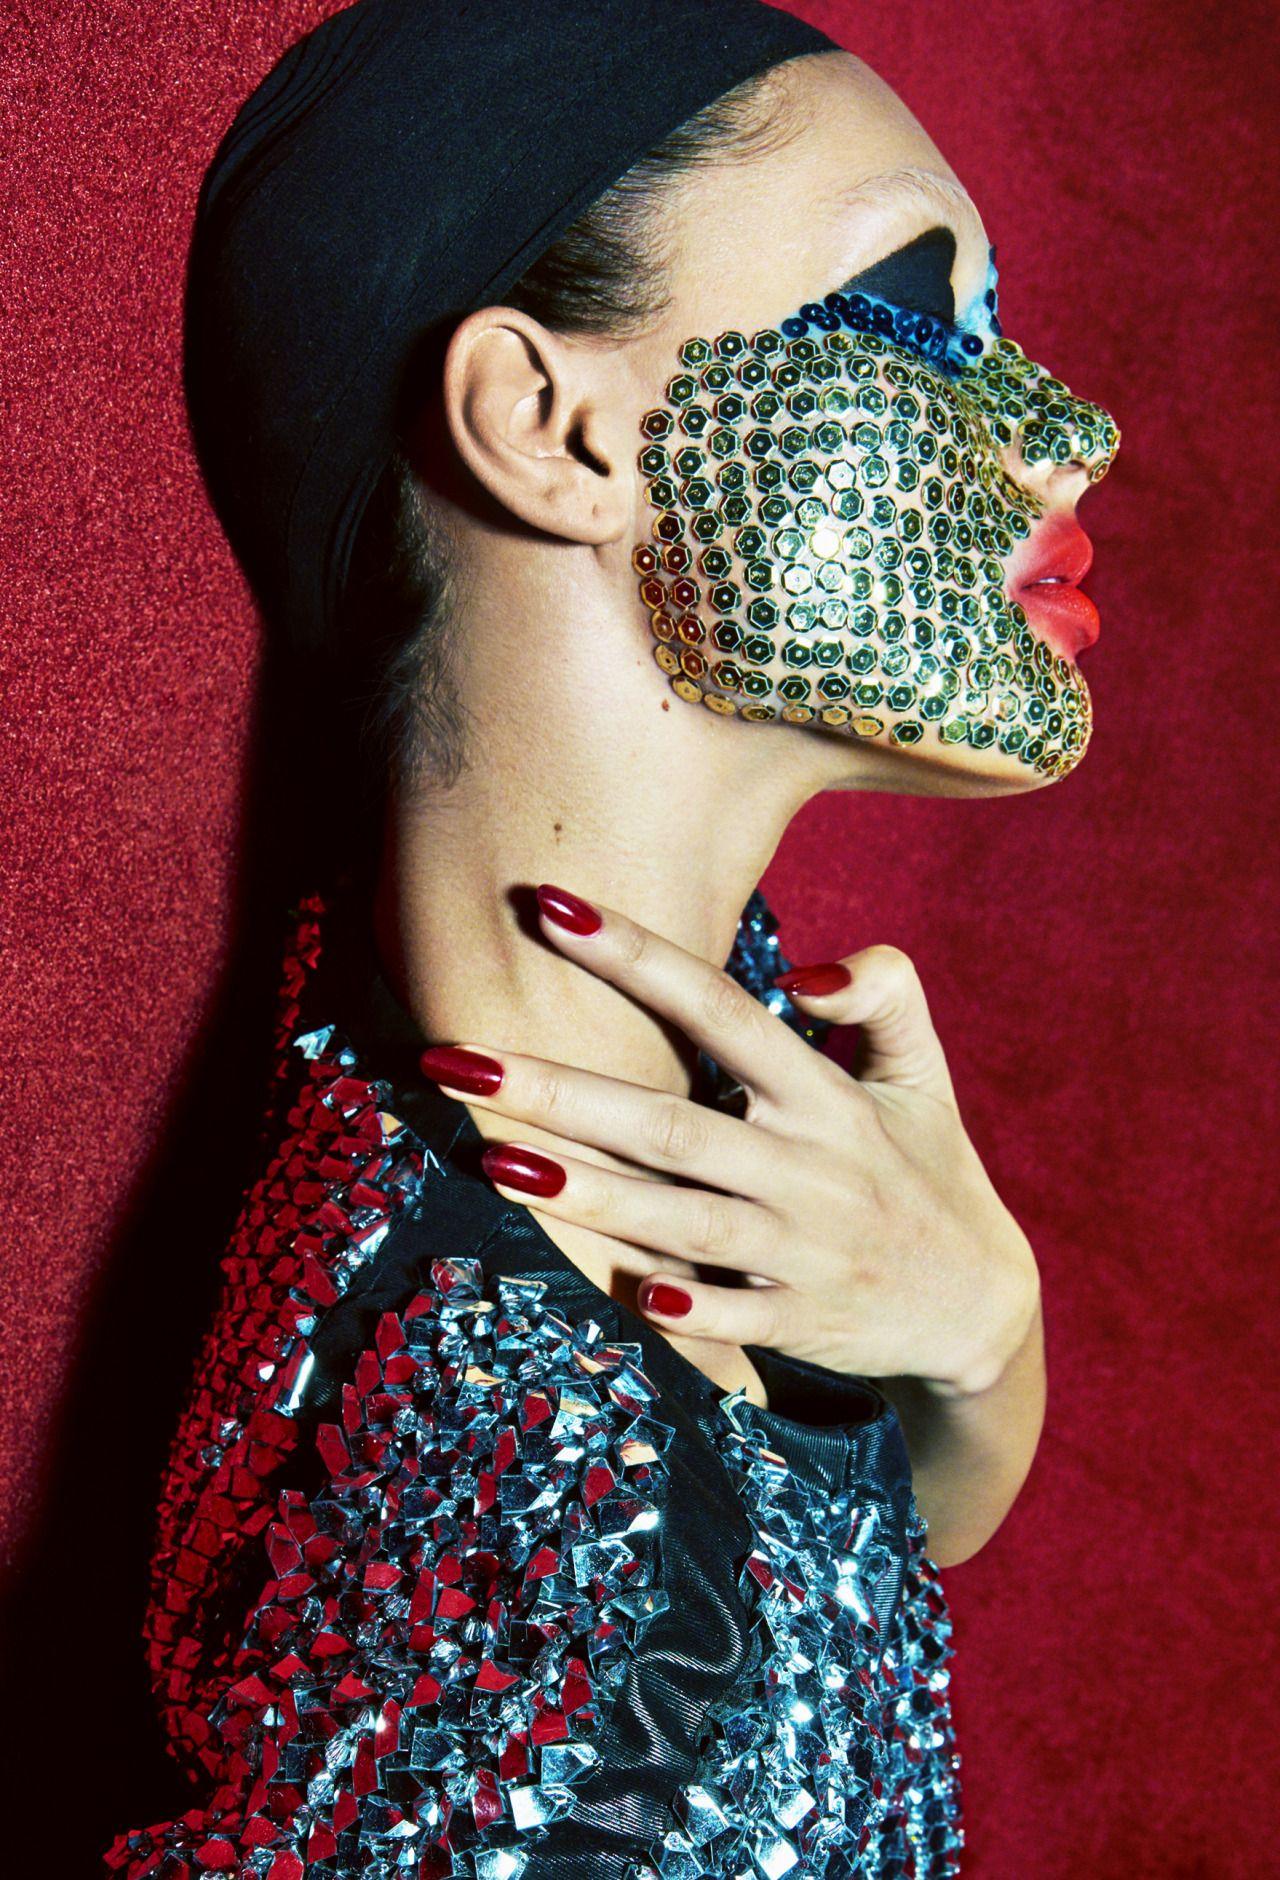 Attache-moi Publication: Numéro May 2016 Model: Charlee Fraser Photographer: Greg Kadel Fashion Editor: Charles Varenne  Hair: Shingo Shibata  Make Up: Maud Laceppe Nails: Casey Herman